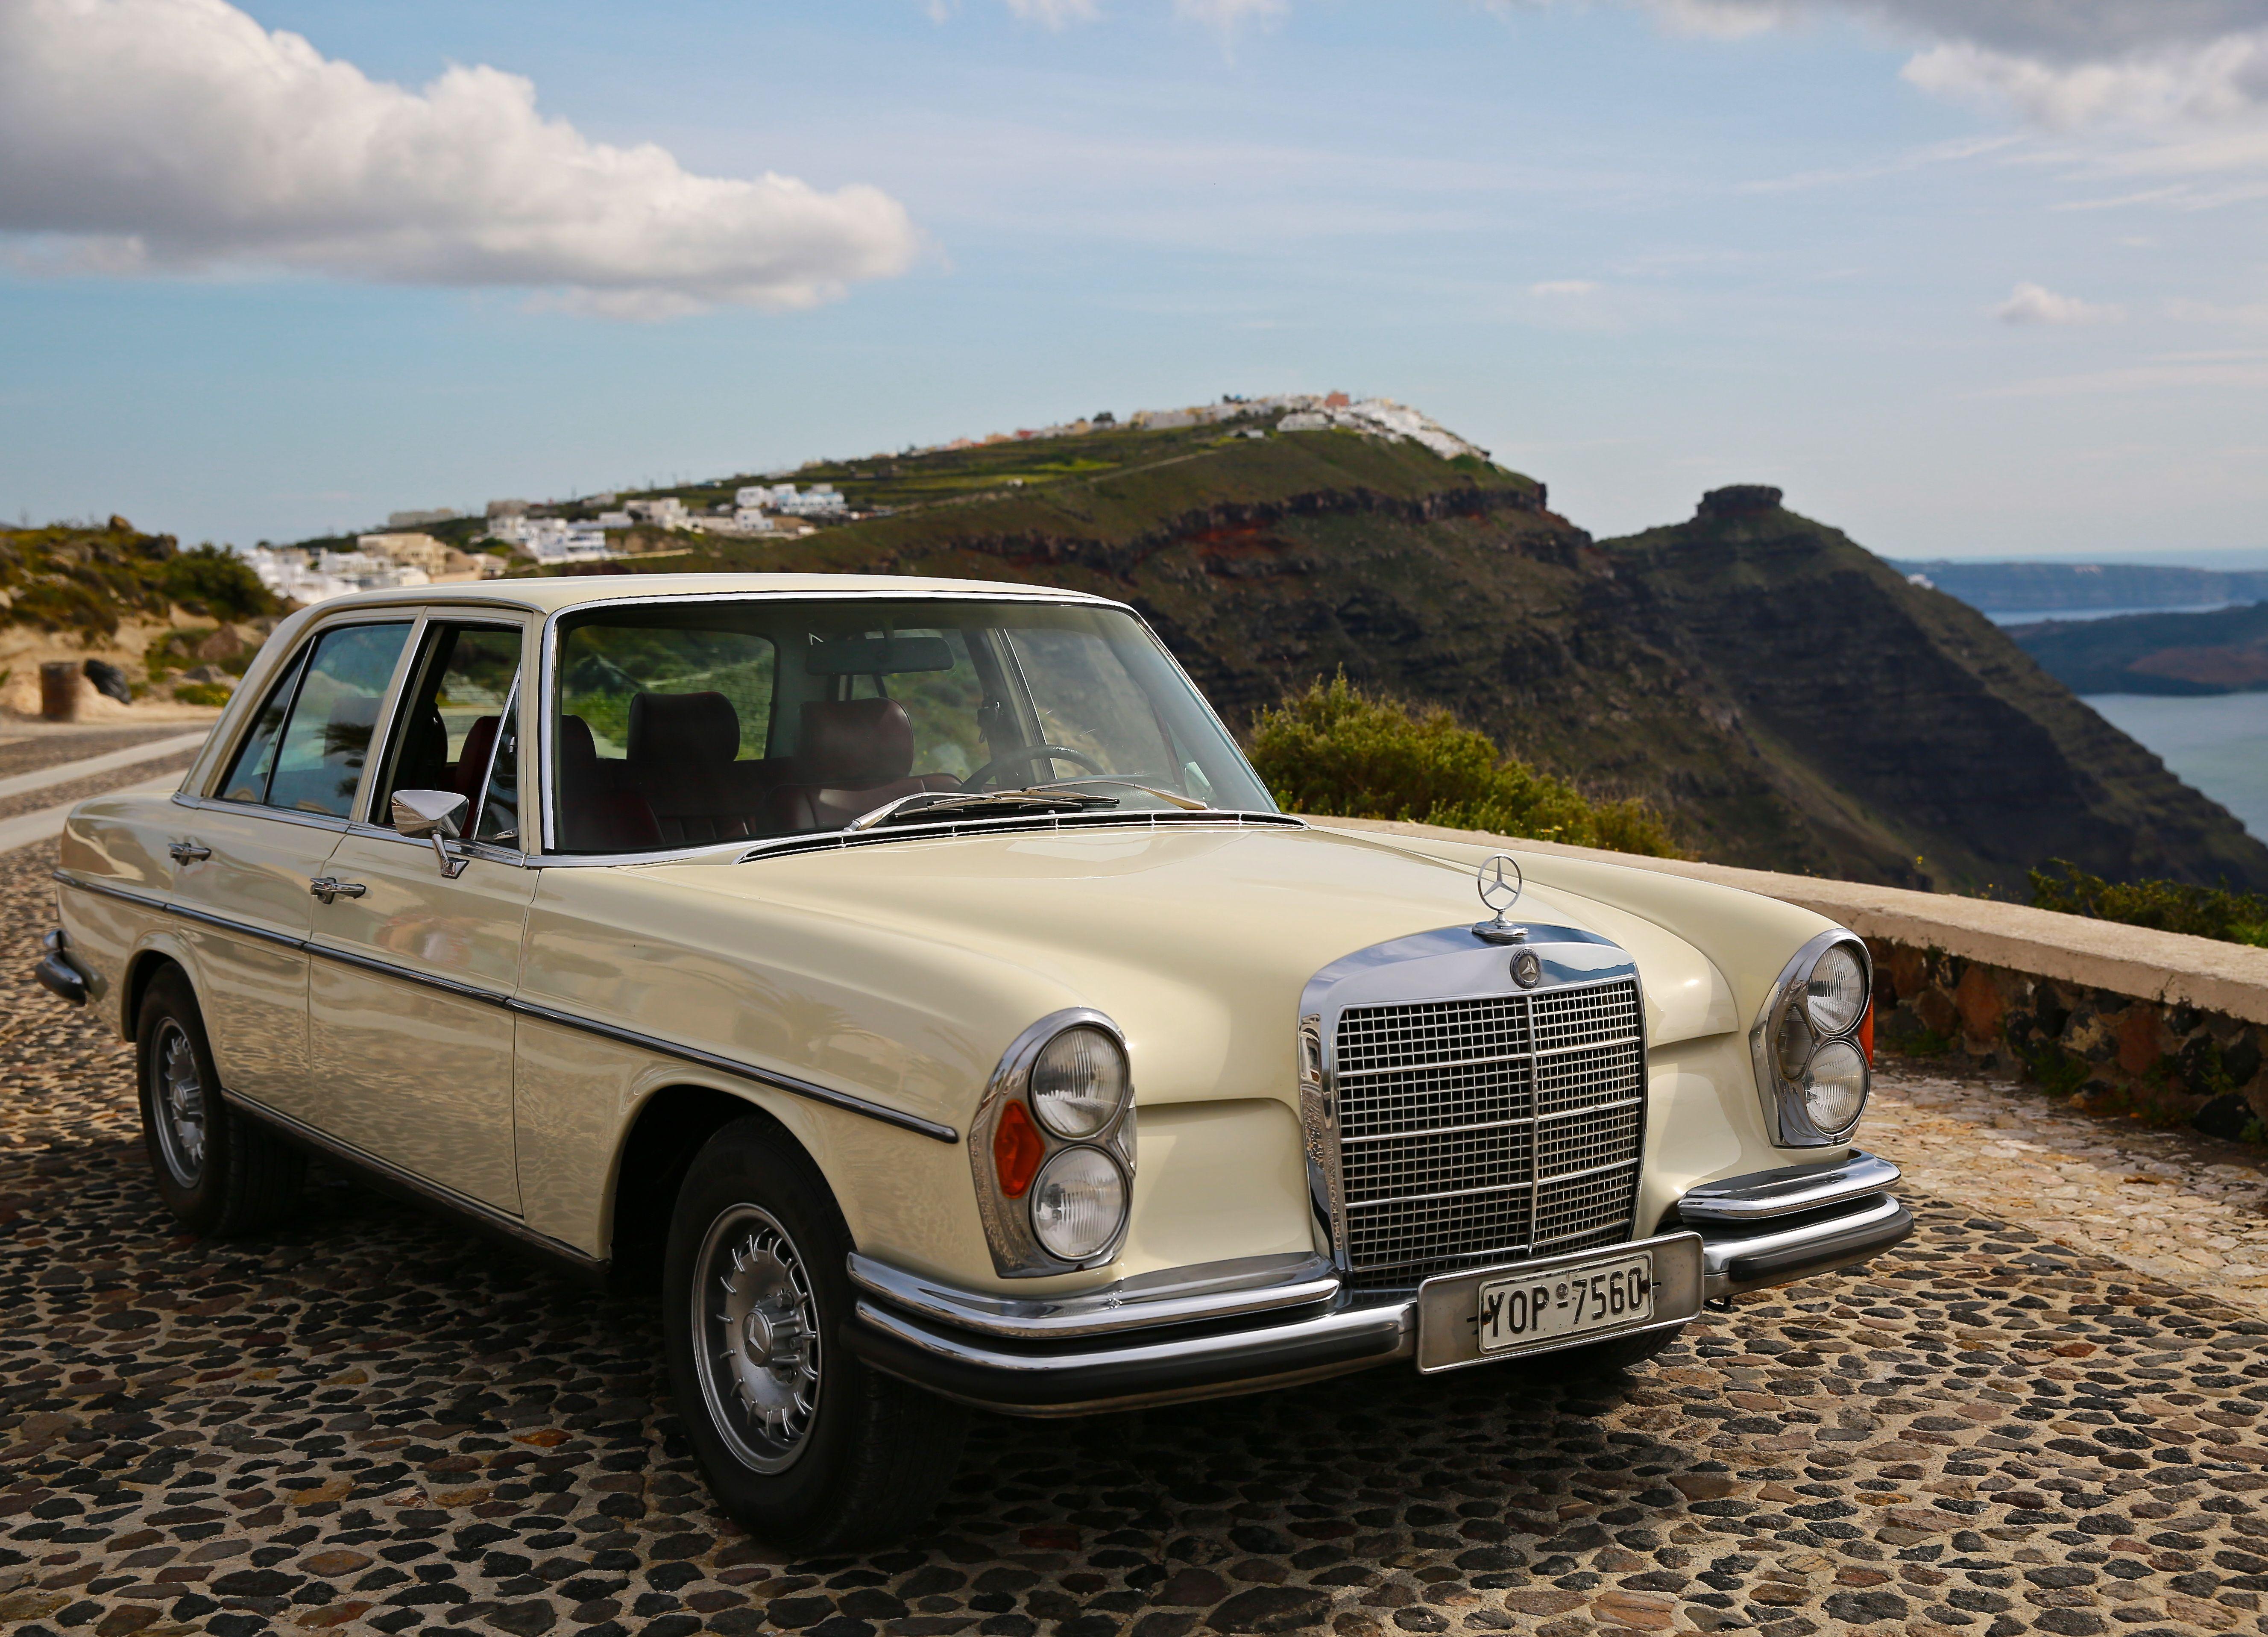 Mercedes Americana Vintage Model Wedding Cars Santorini - Cool cars santorini